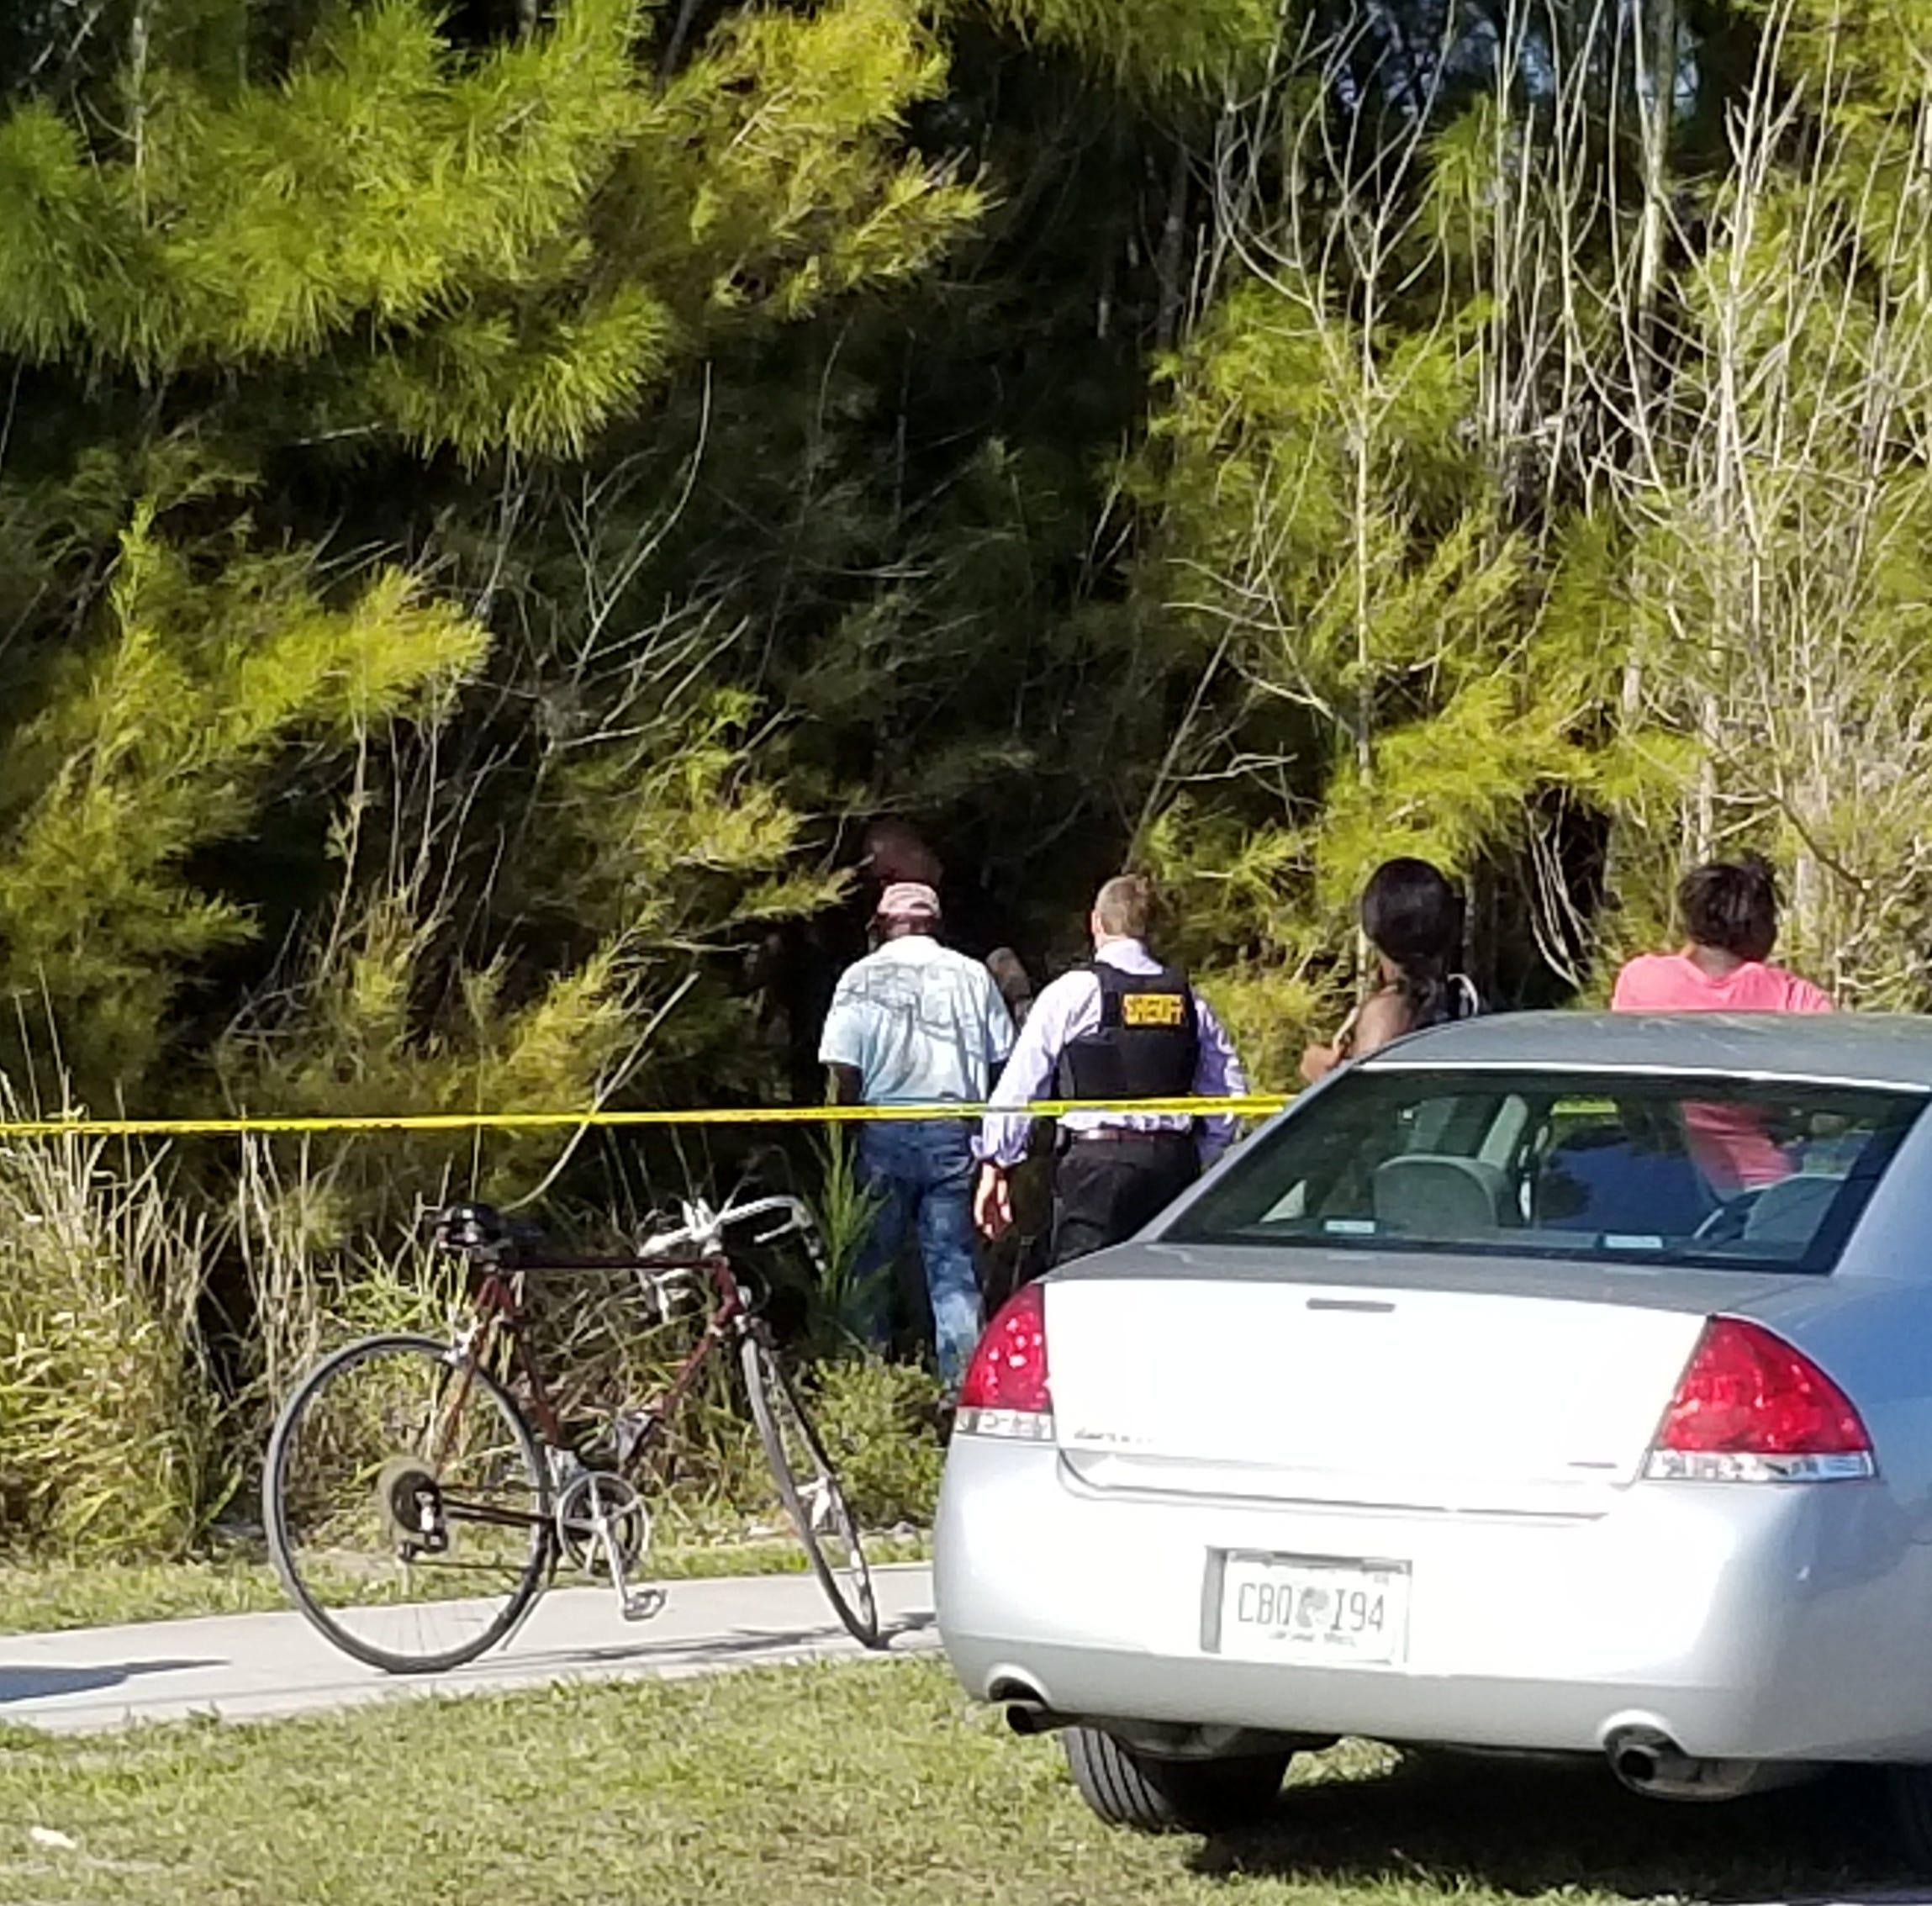 Deputies identify body found in bushes along road in Gifford